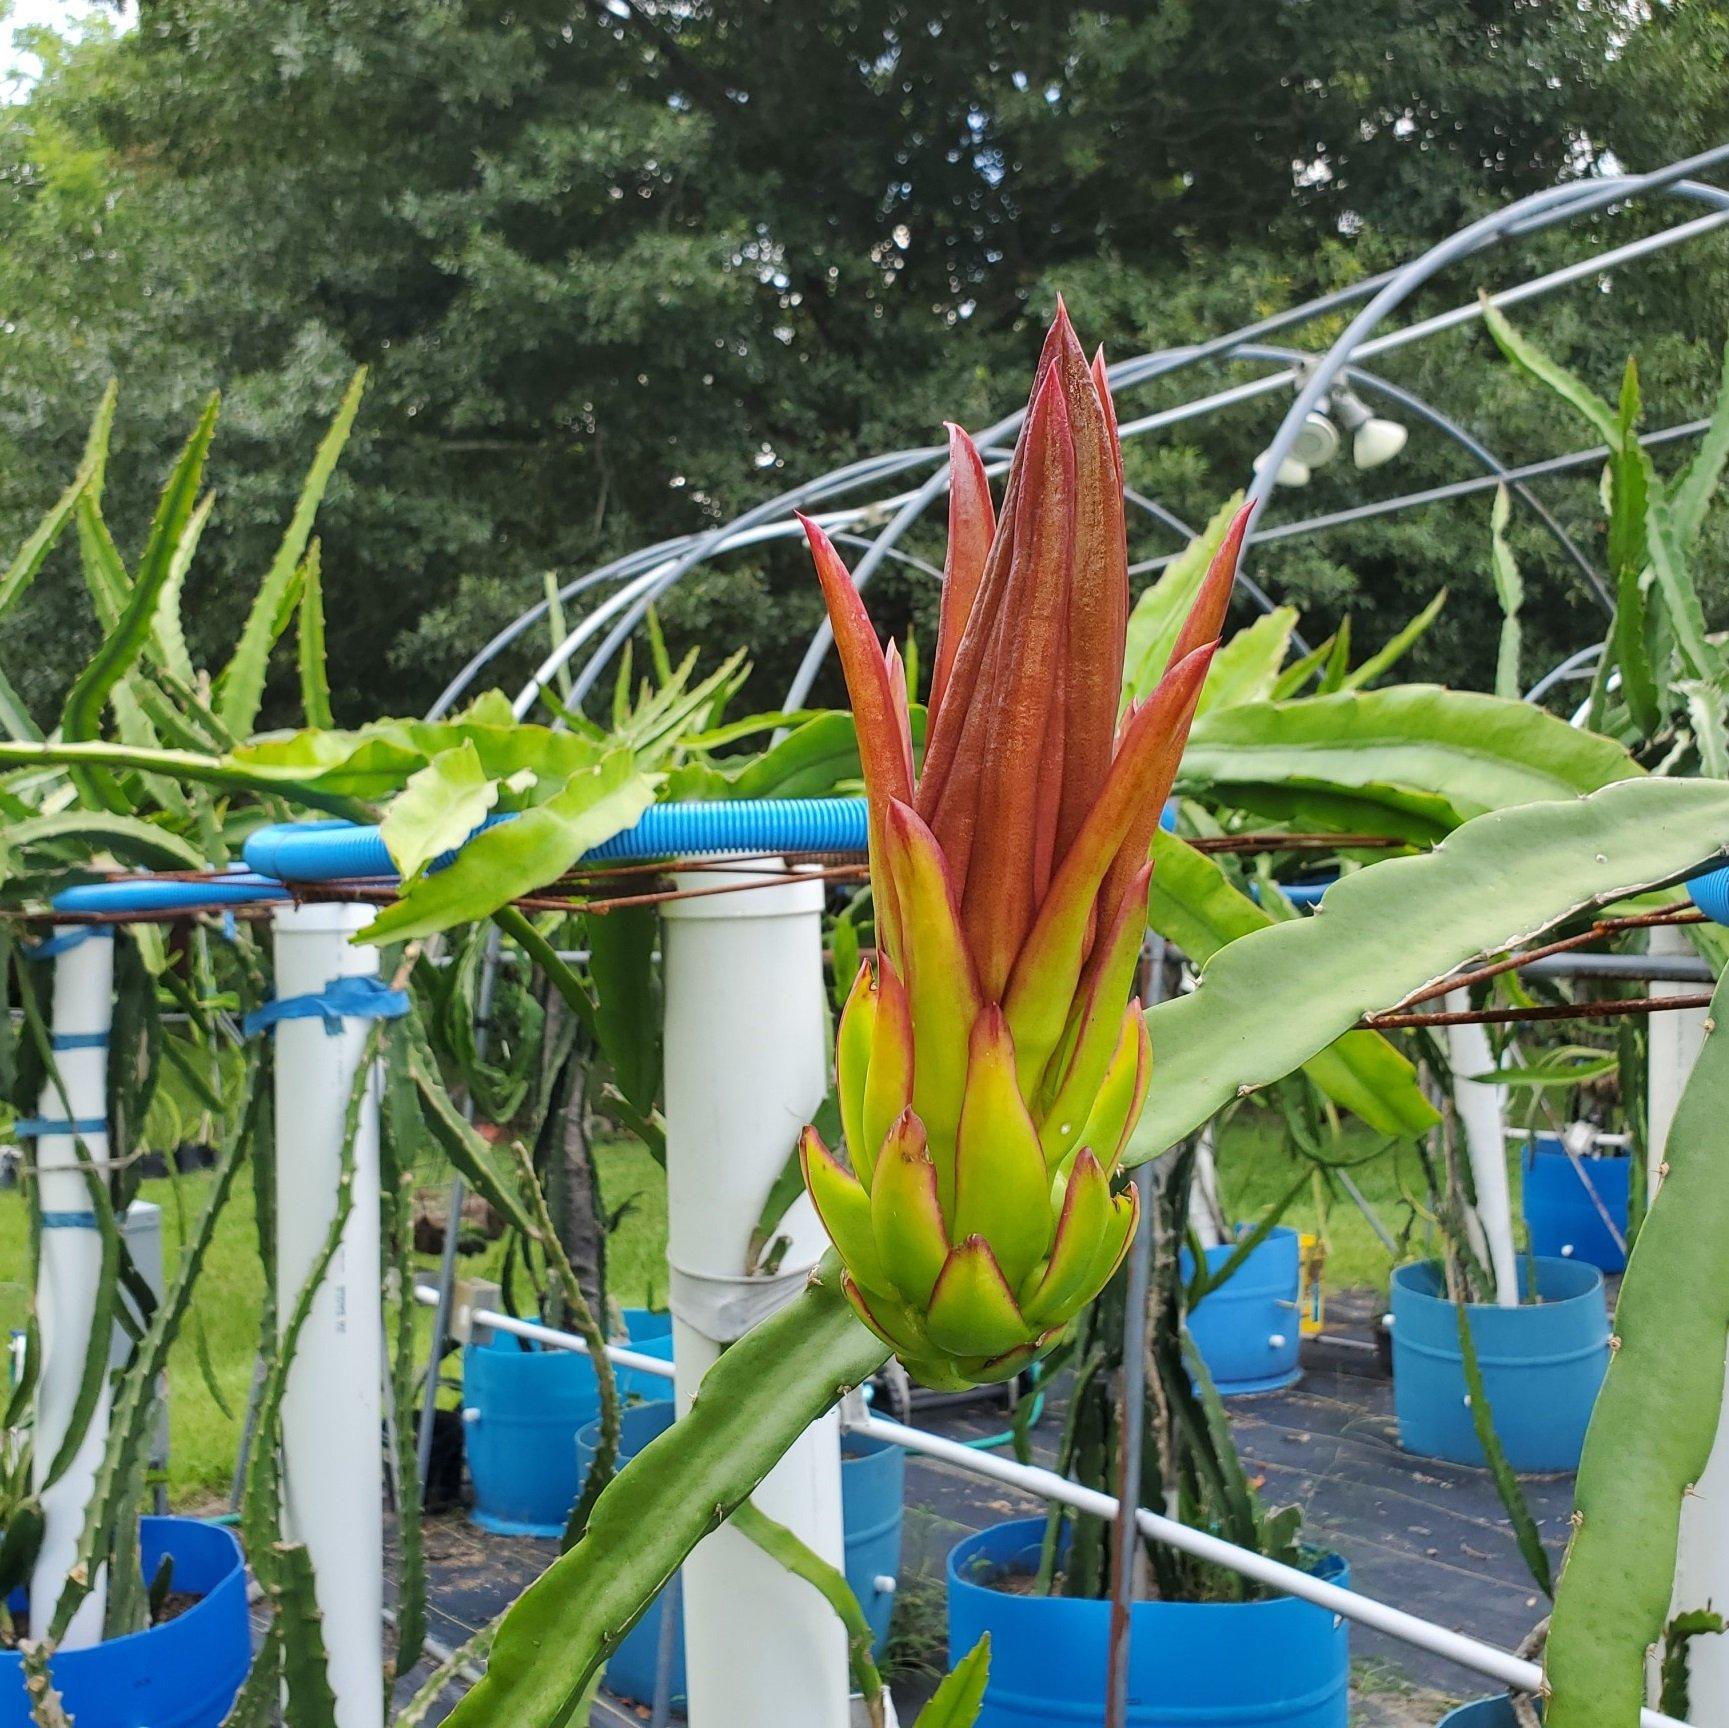 Asunta 4 Dragon Fruit Flower Bud